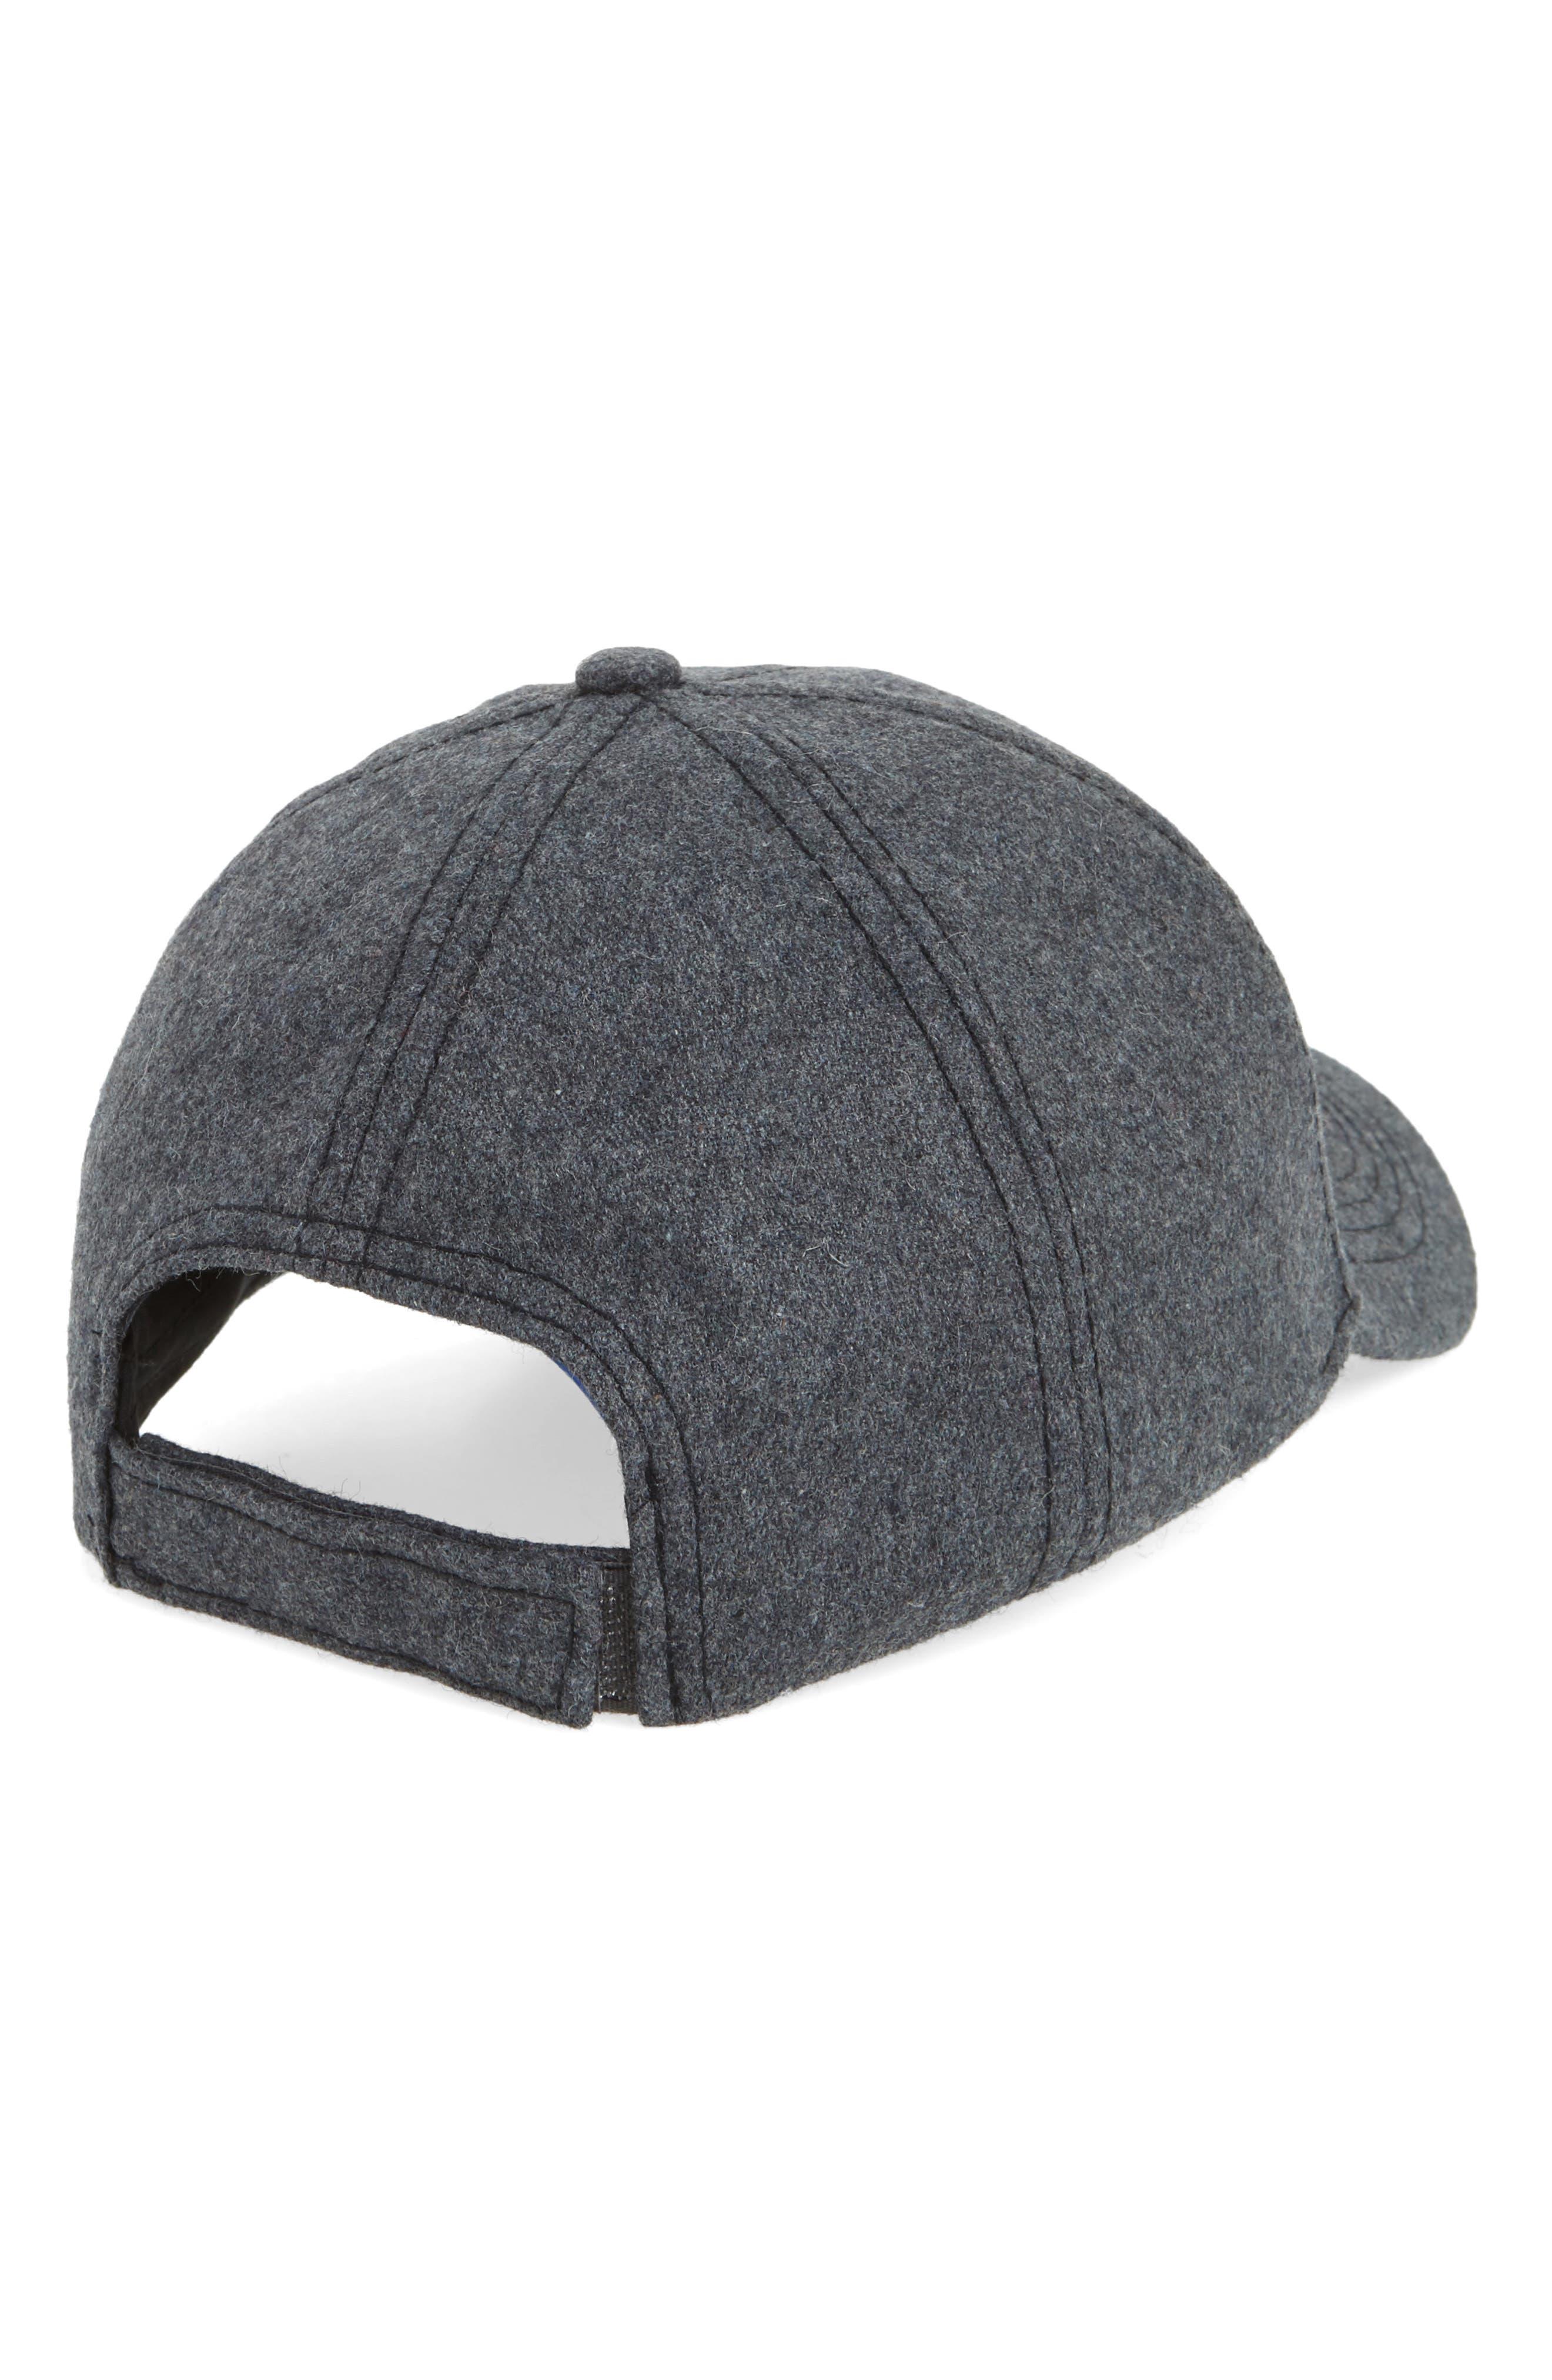 Embroidered Baseball Cap,                             Alternate thumbnail 2, color,                             Grey